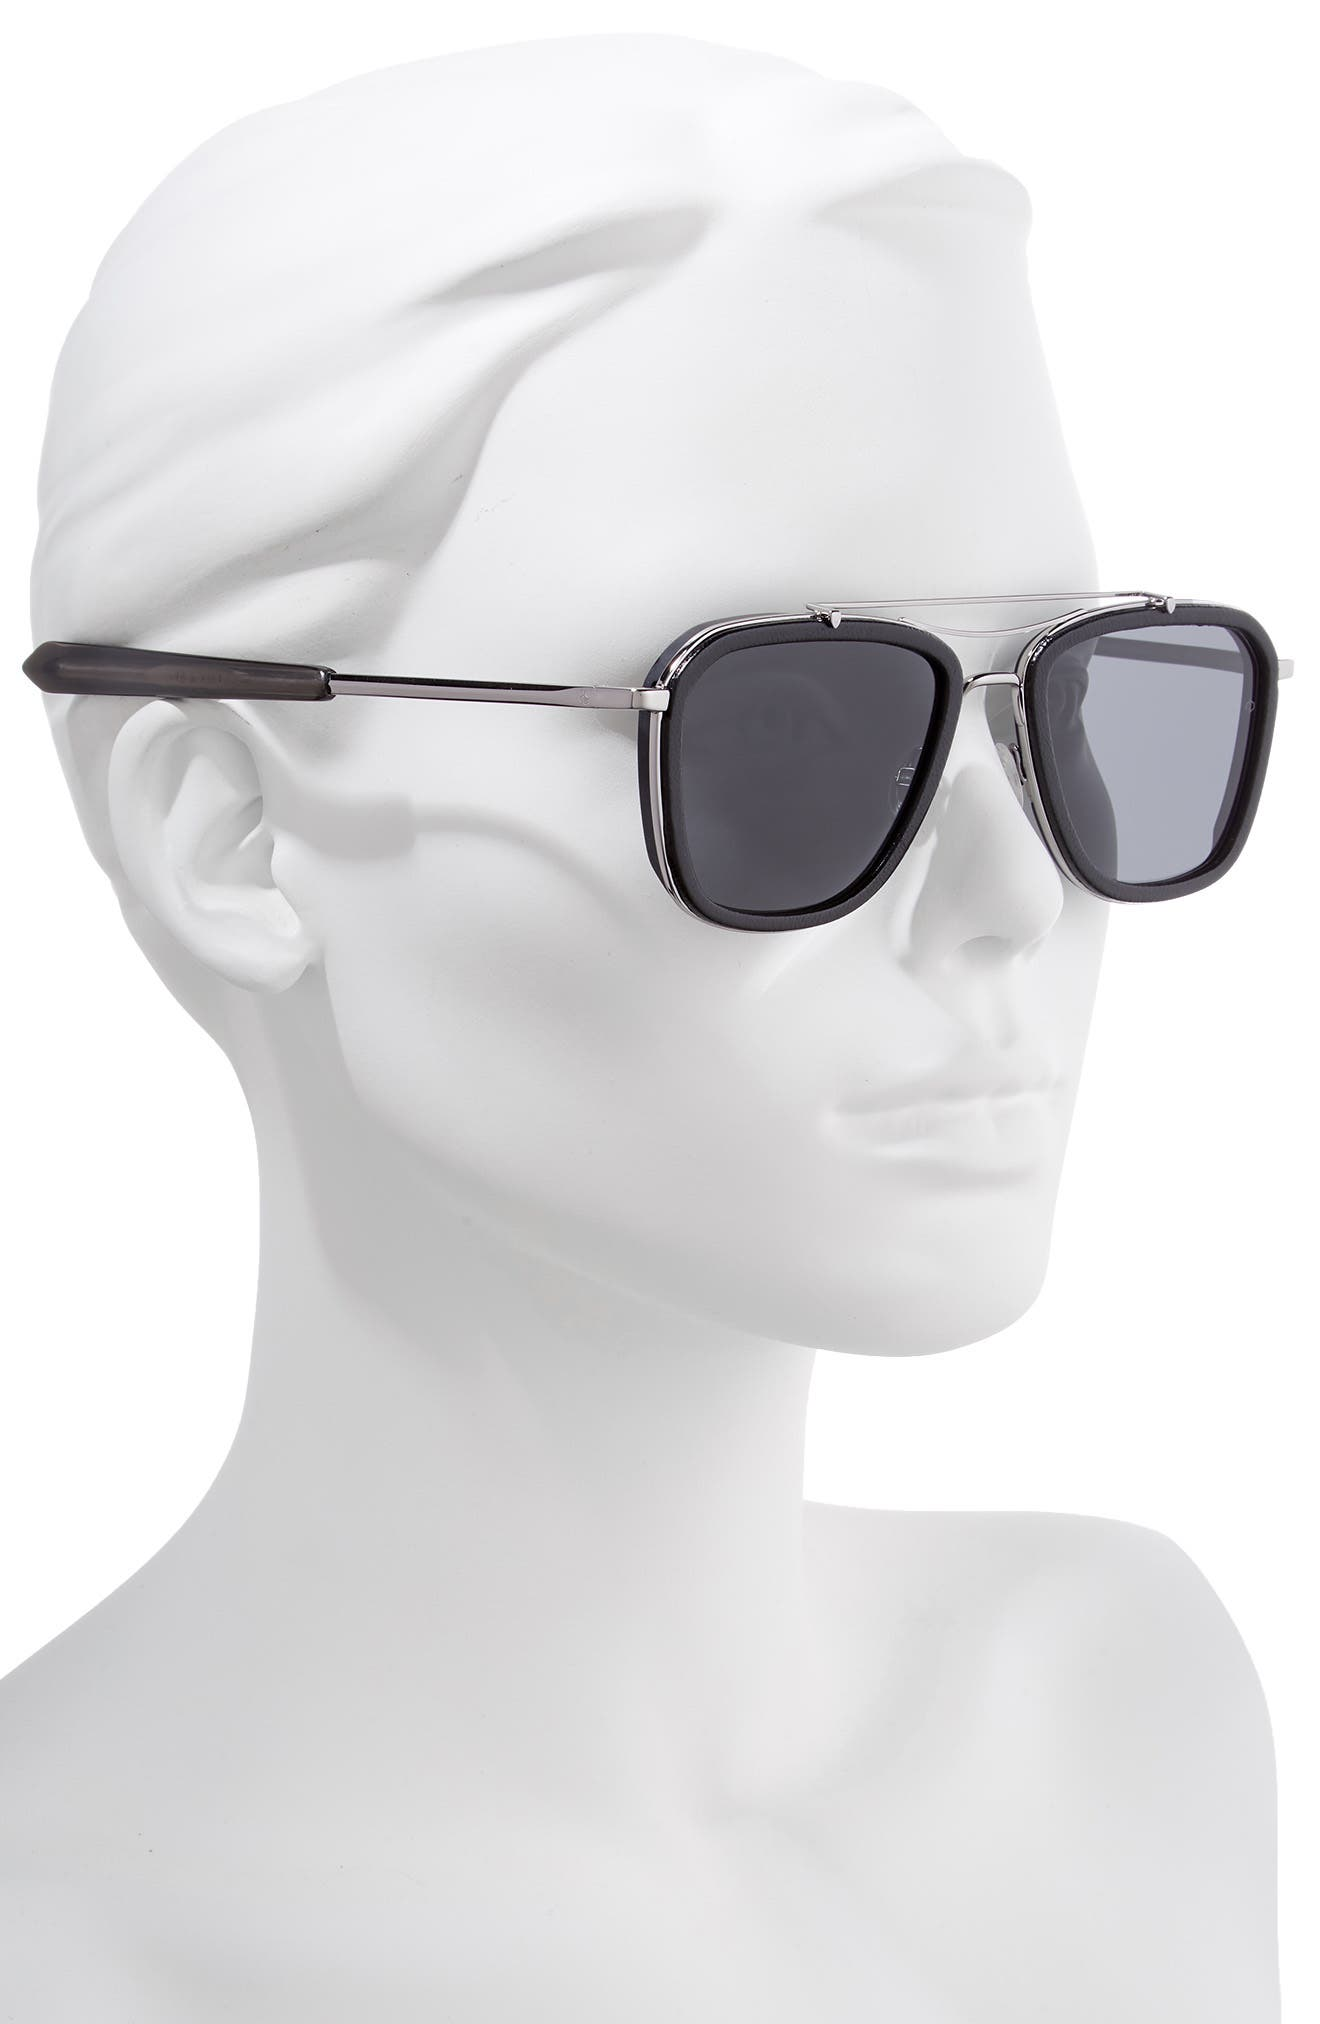 Phantom 54mm Aviator Sunglasses,                             Alternate thumbnail 2, color,                             RUTHENIUM/ BLACK